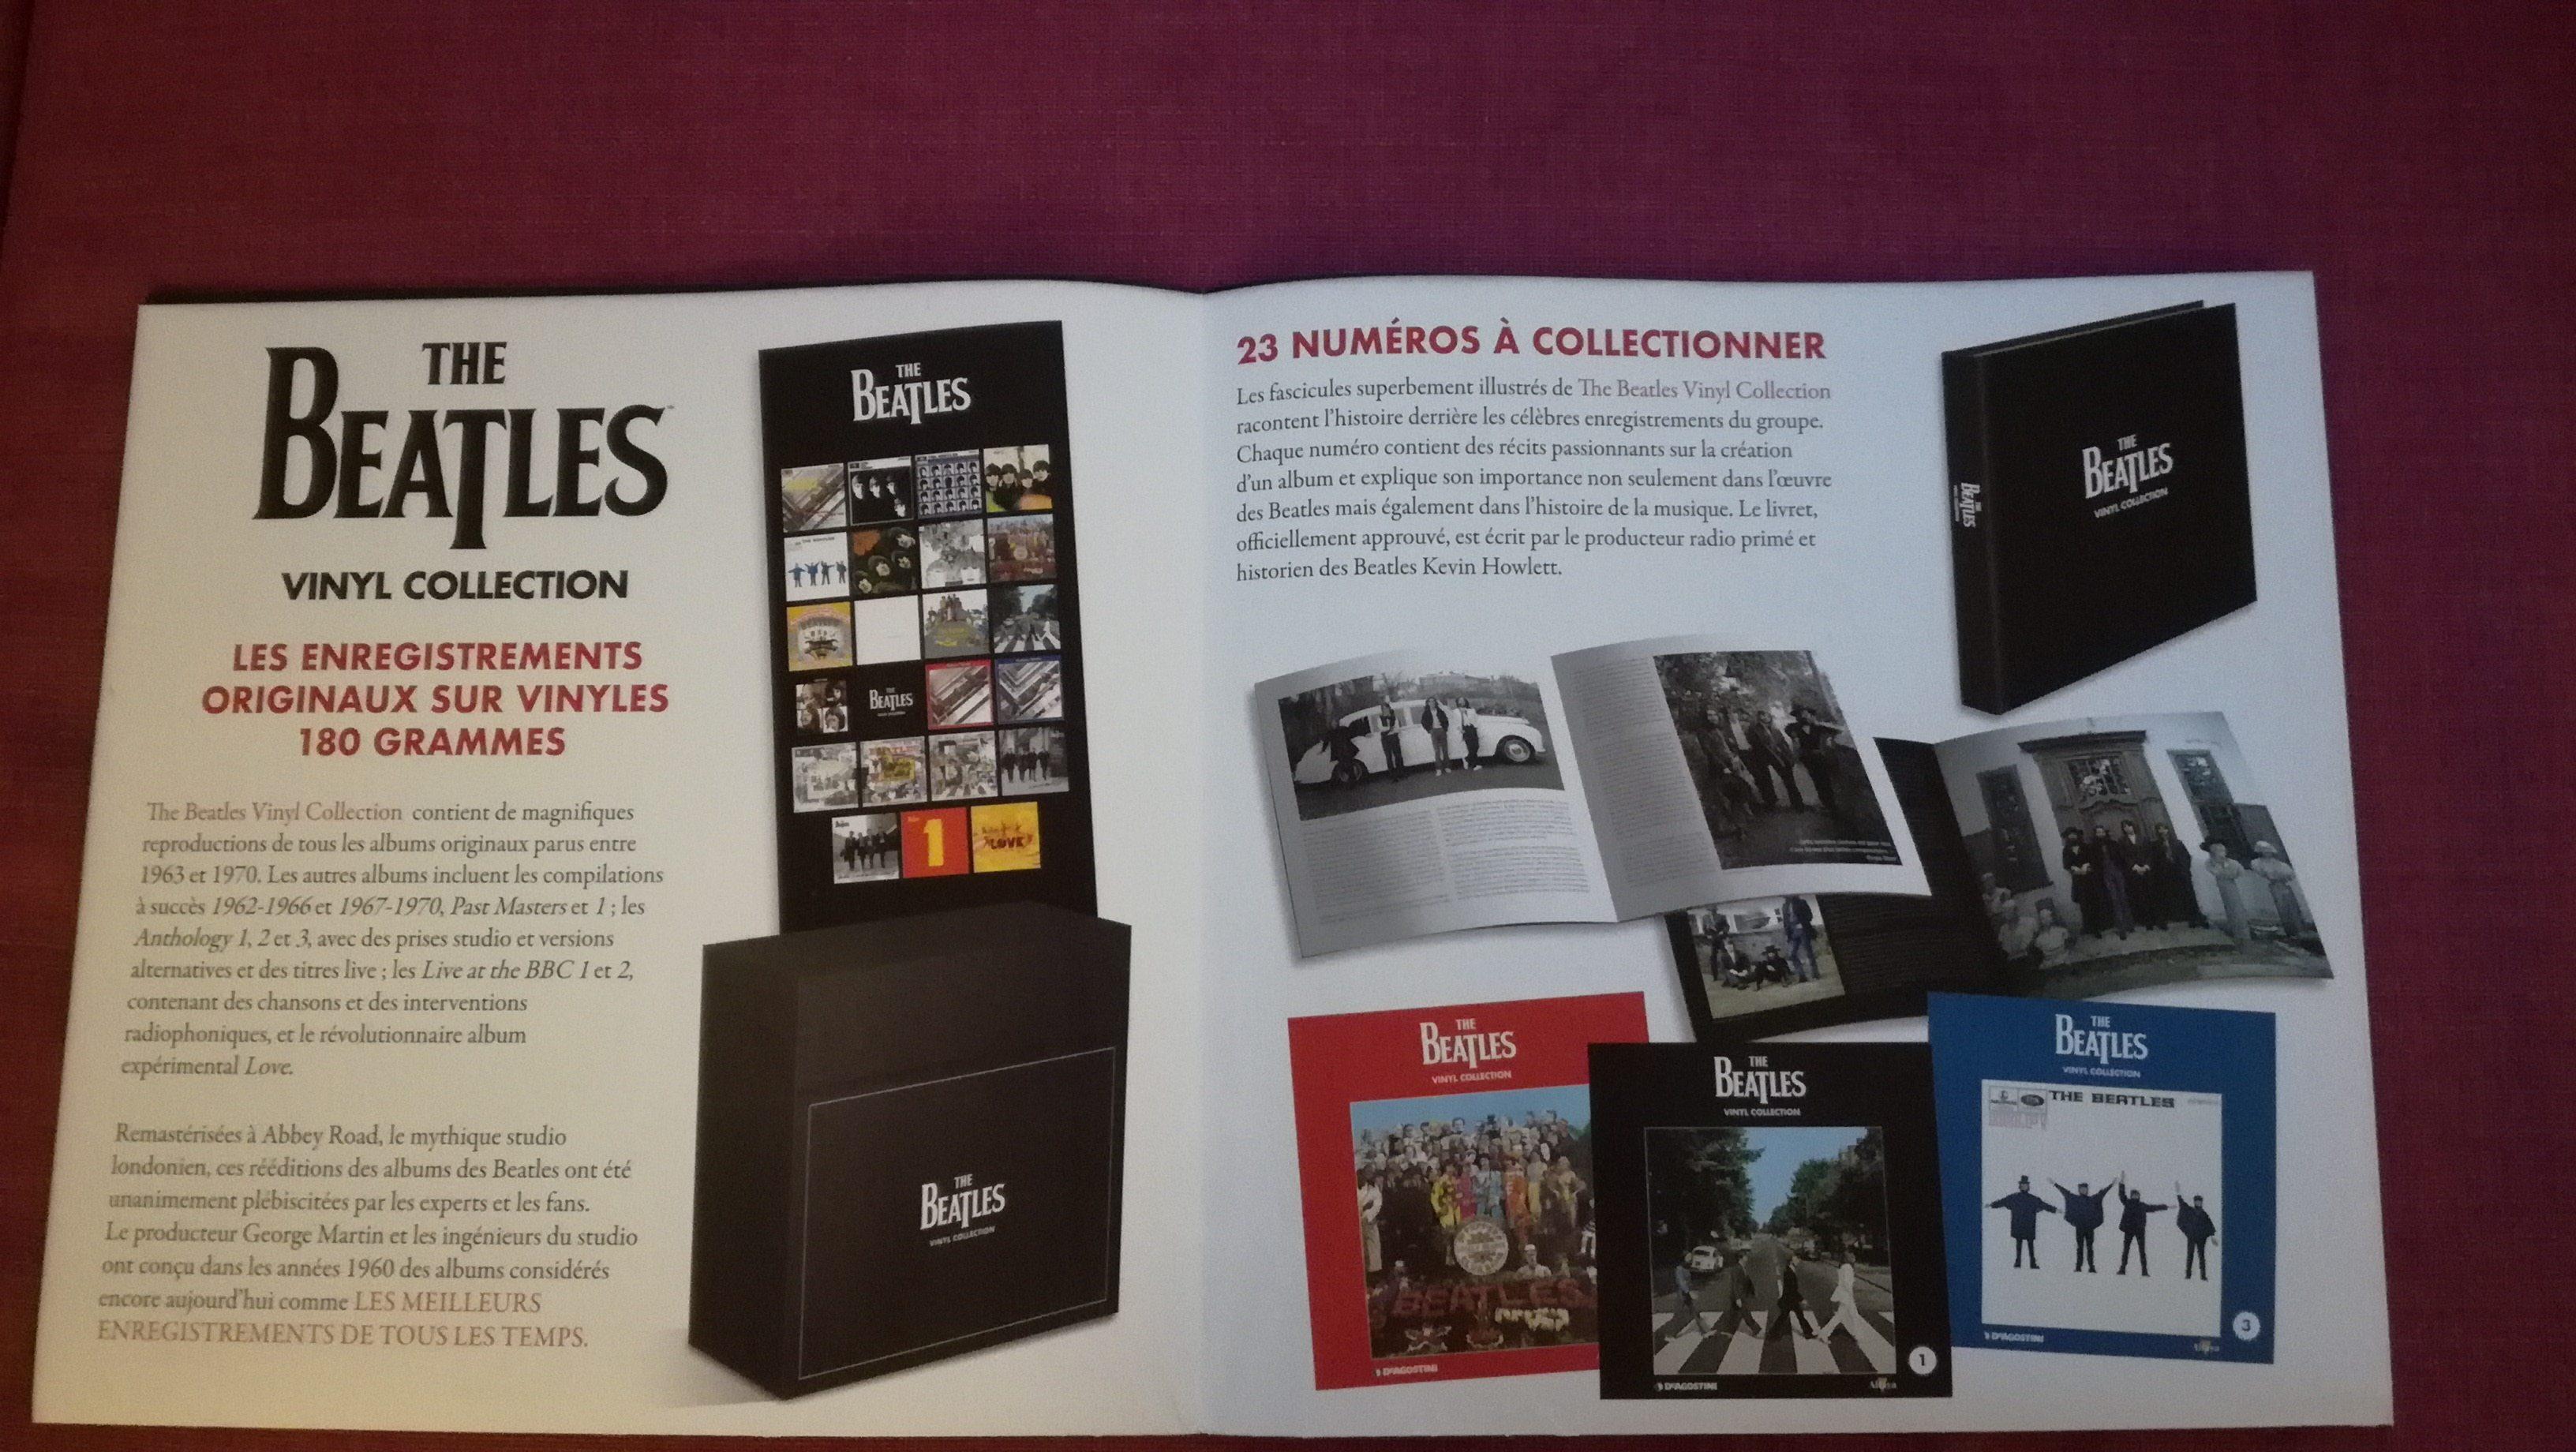 Collection Vinyle The Beatles Avec Altaya Vinyle Actu